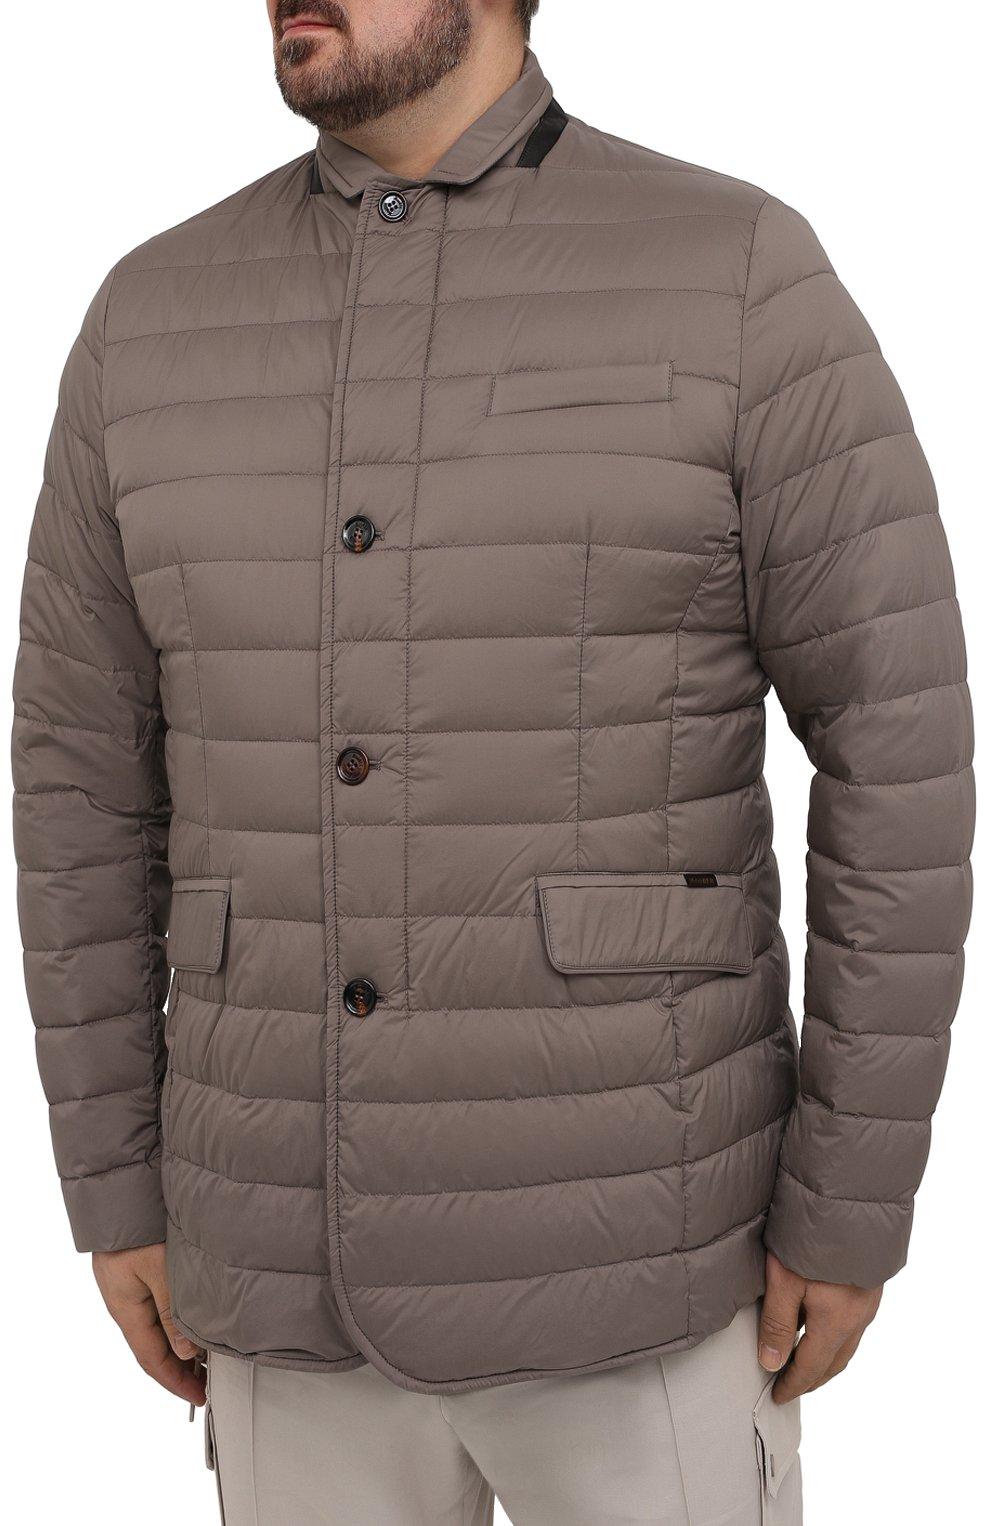 Мужская пуховая куртка zavyer-s3 MOORER бежевого цвета, арт. ZAVYER-S3/M0UGI100071-TEPA028/60-68   Фото 3